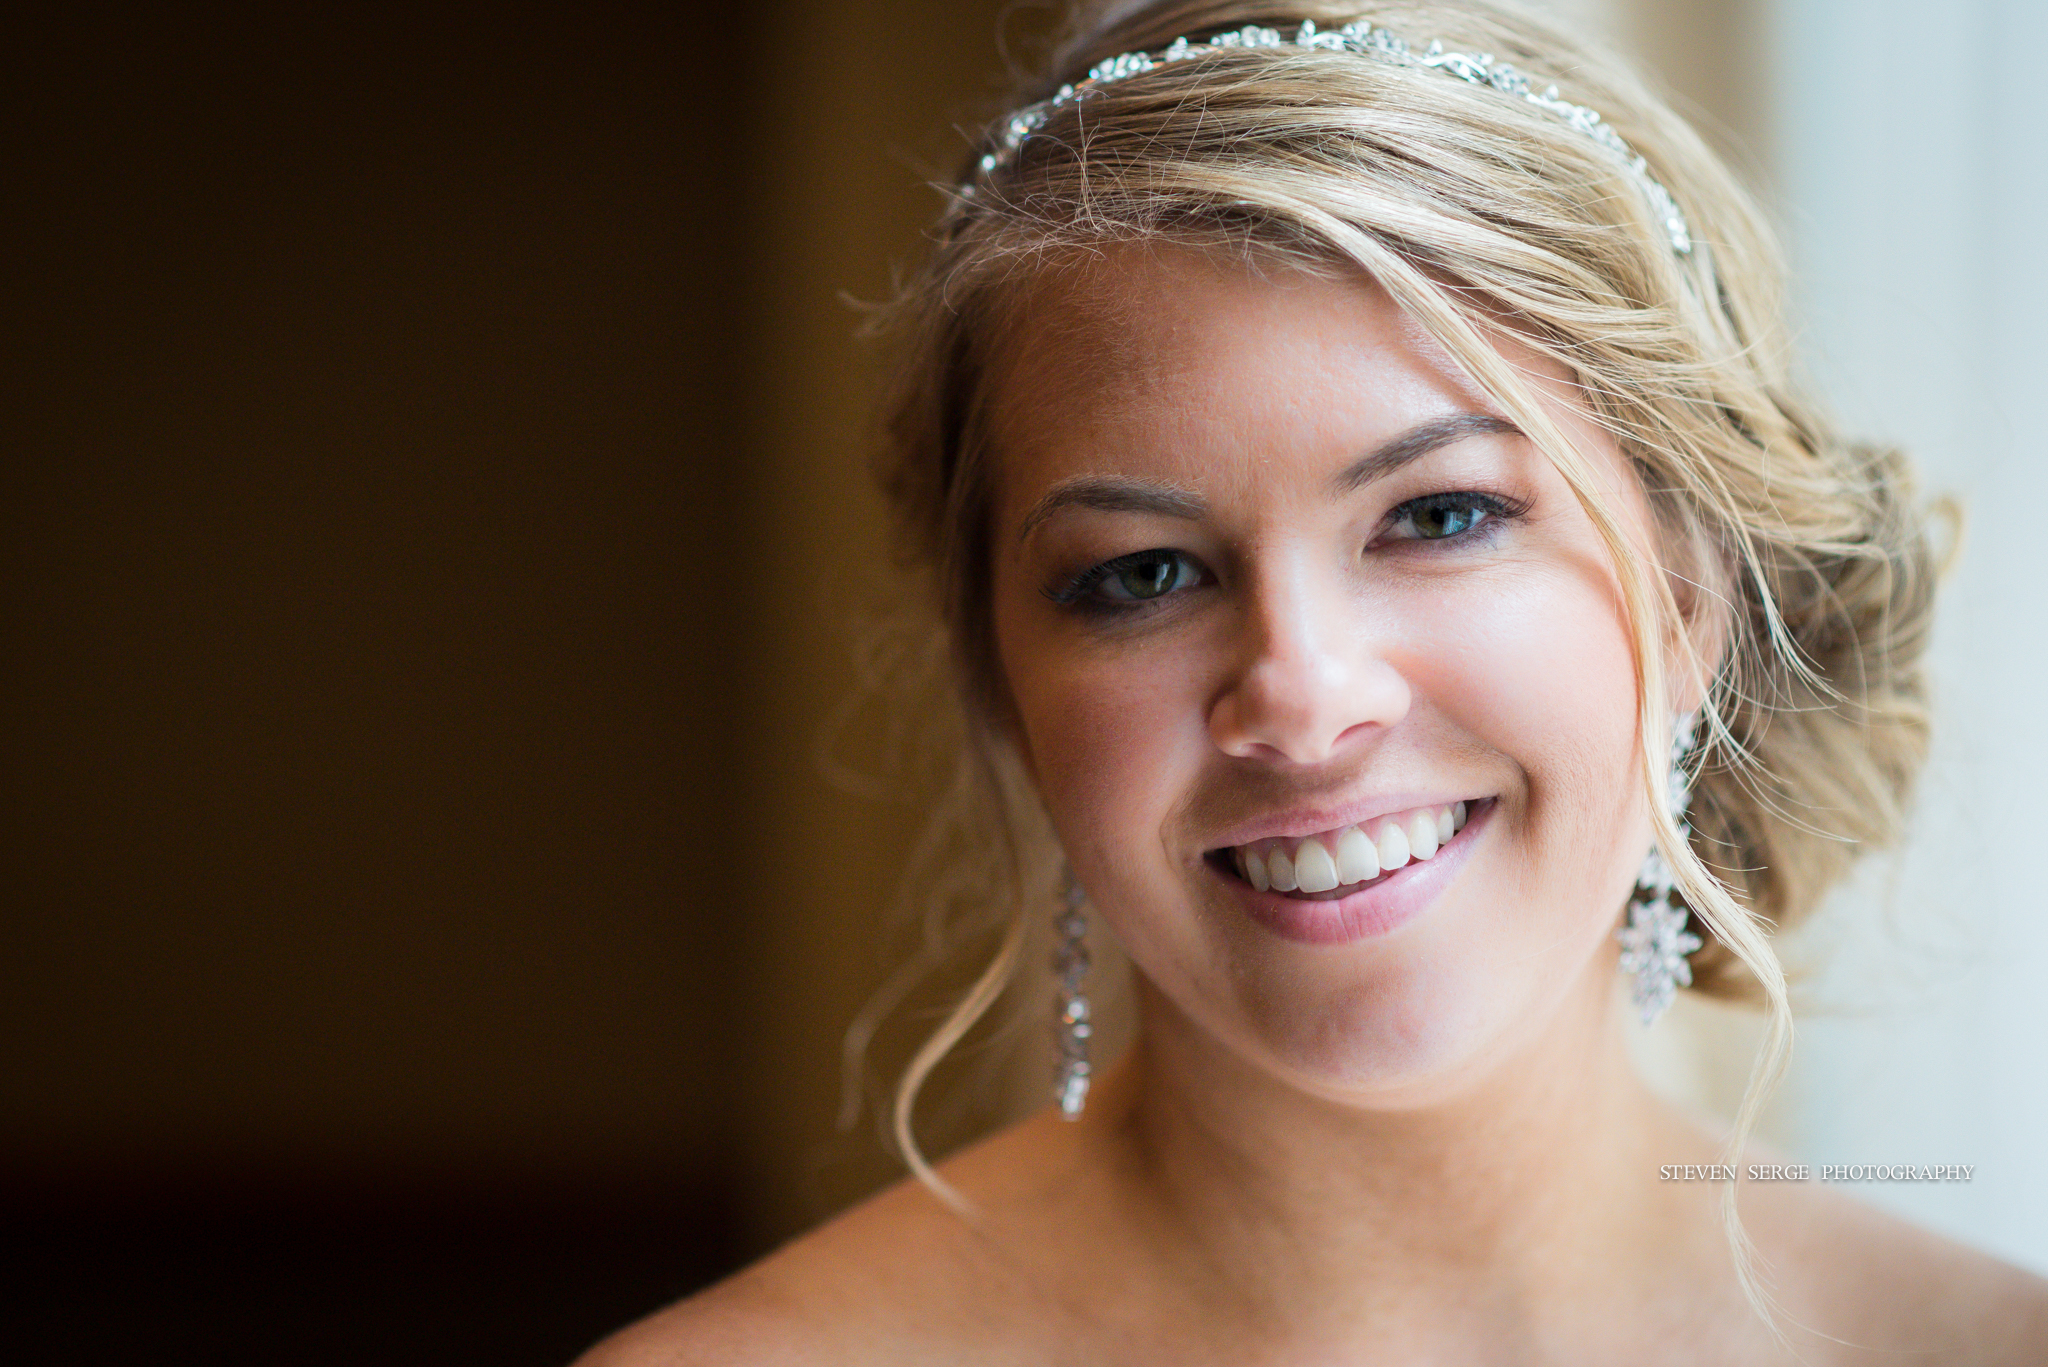 scranton-wedding-photographers-hilton-steven-serge-photography-6.jpg